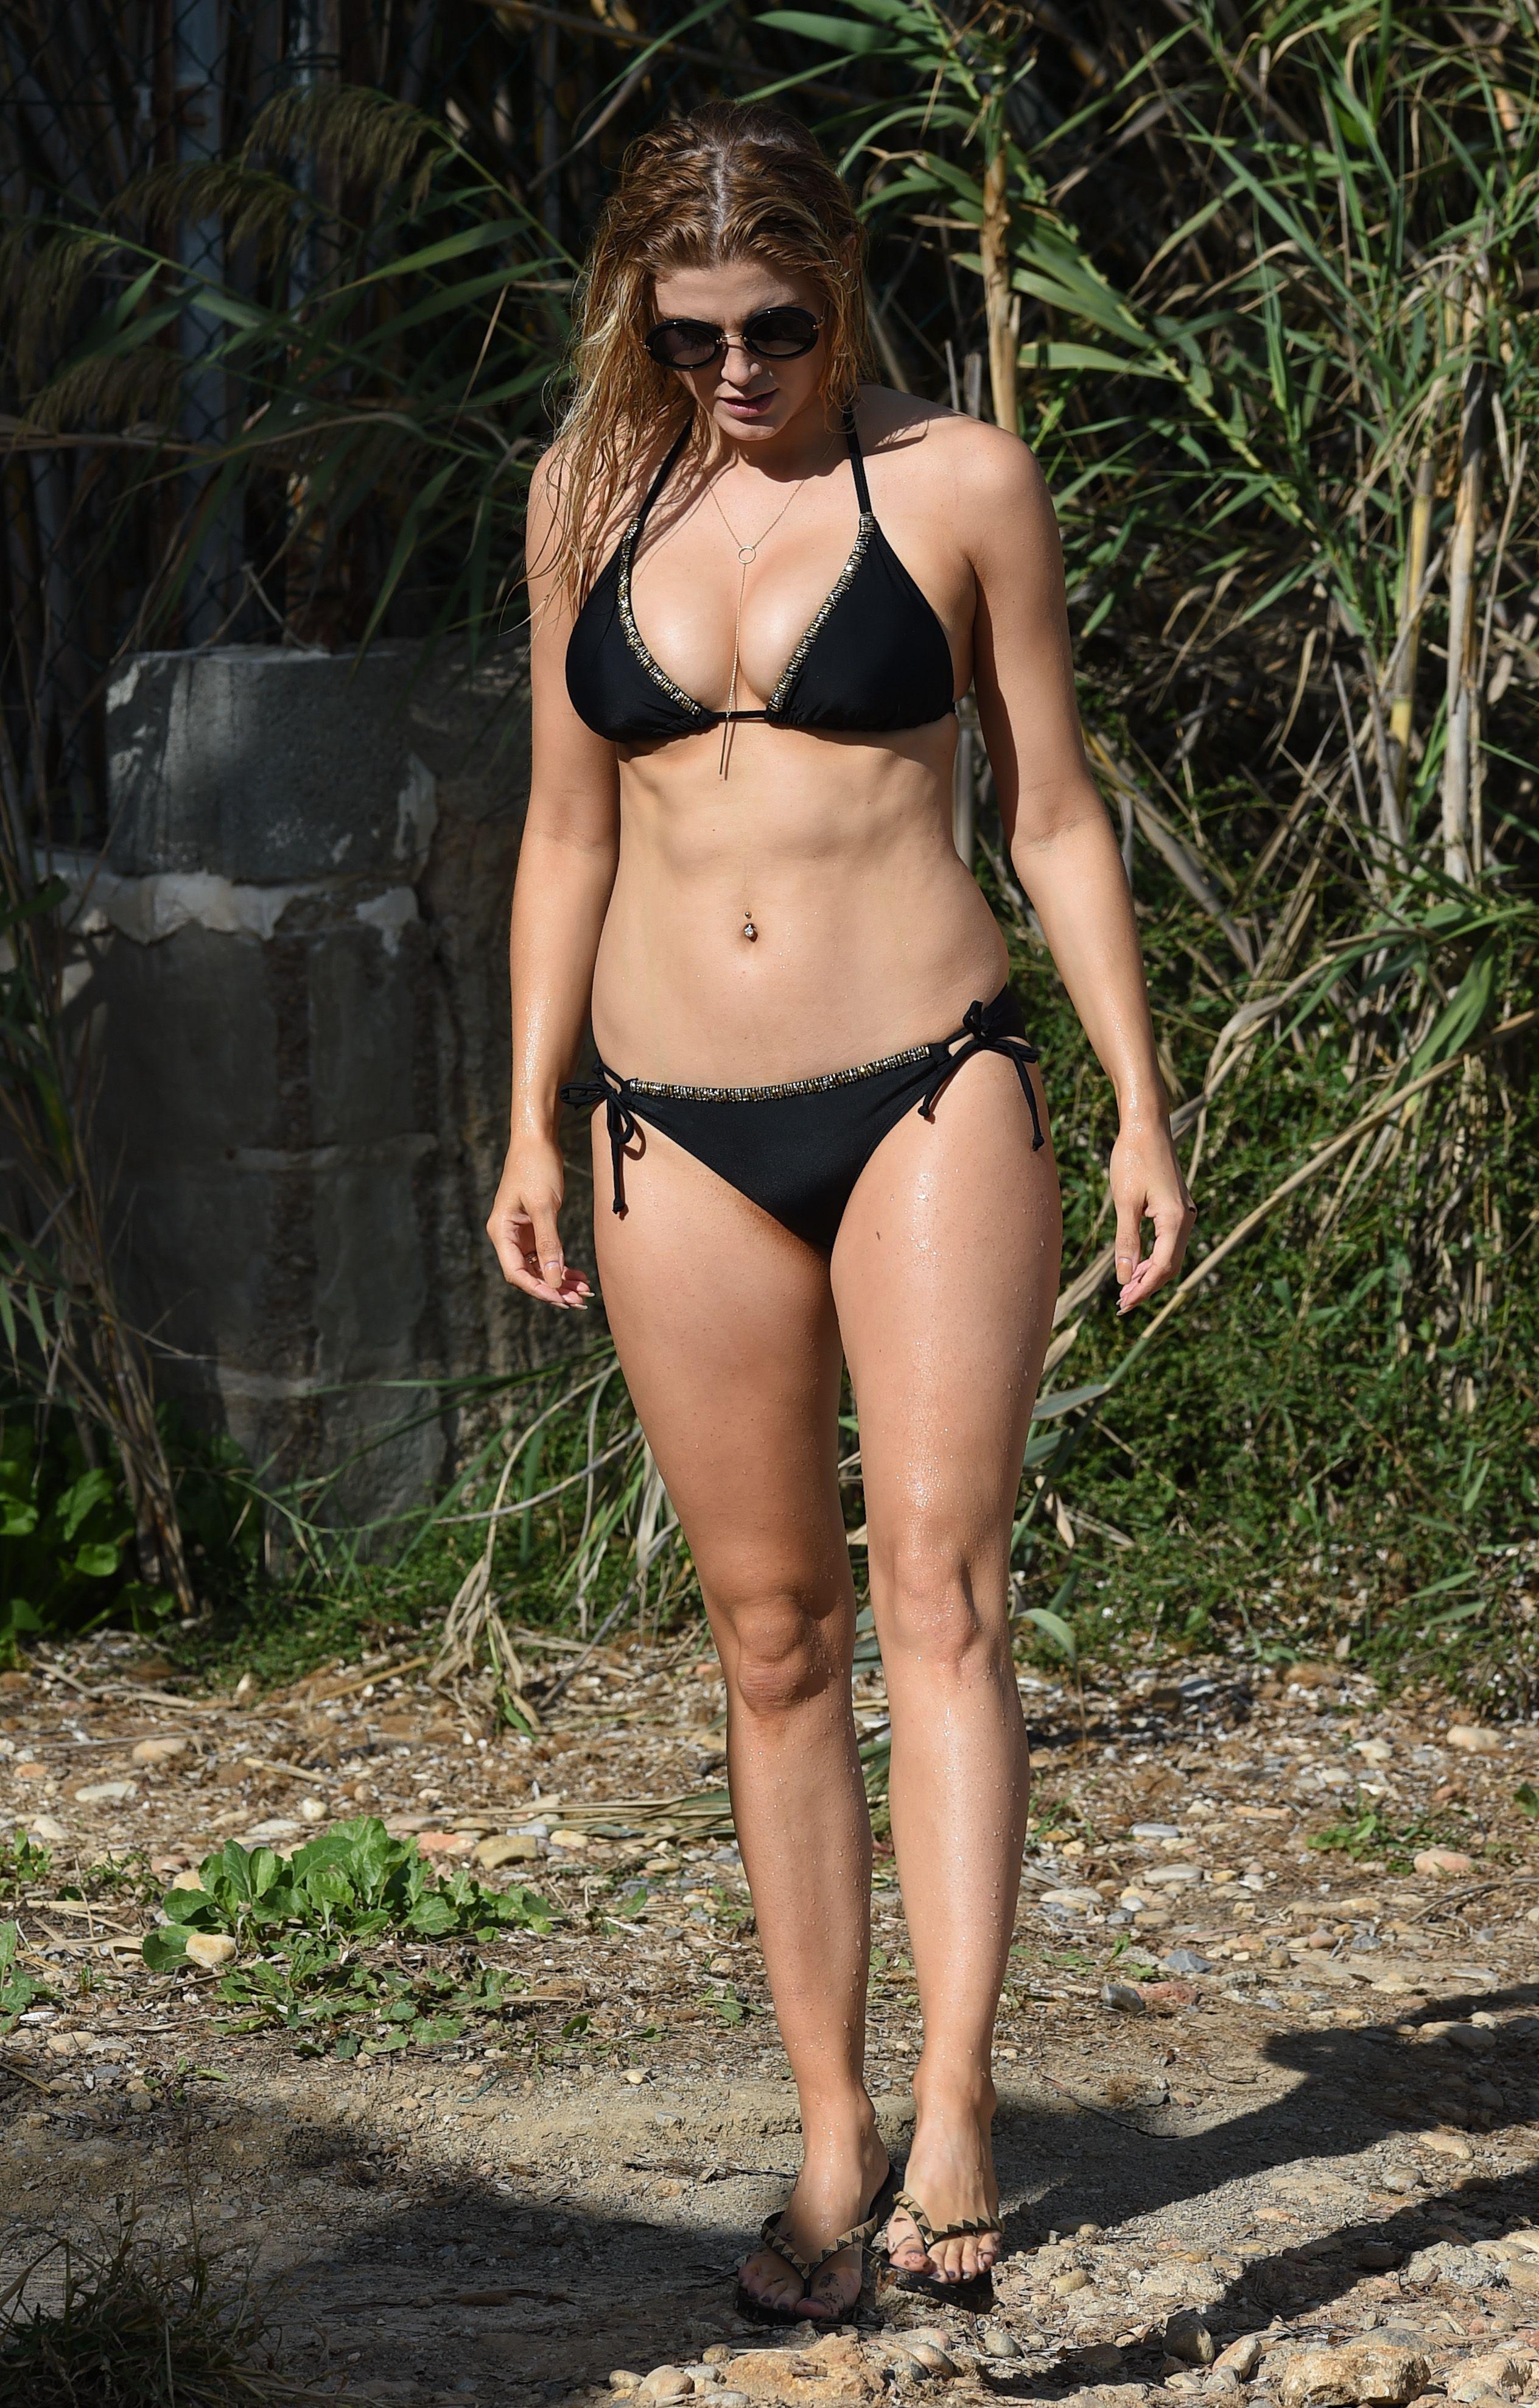 Jessy Erinn Biography model jess miller